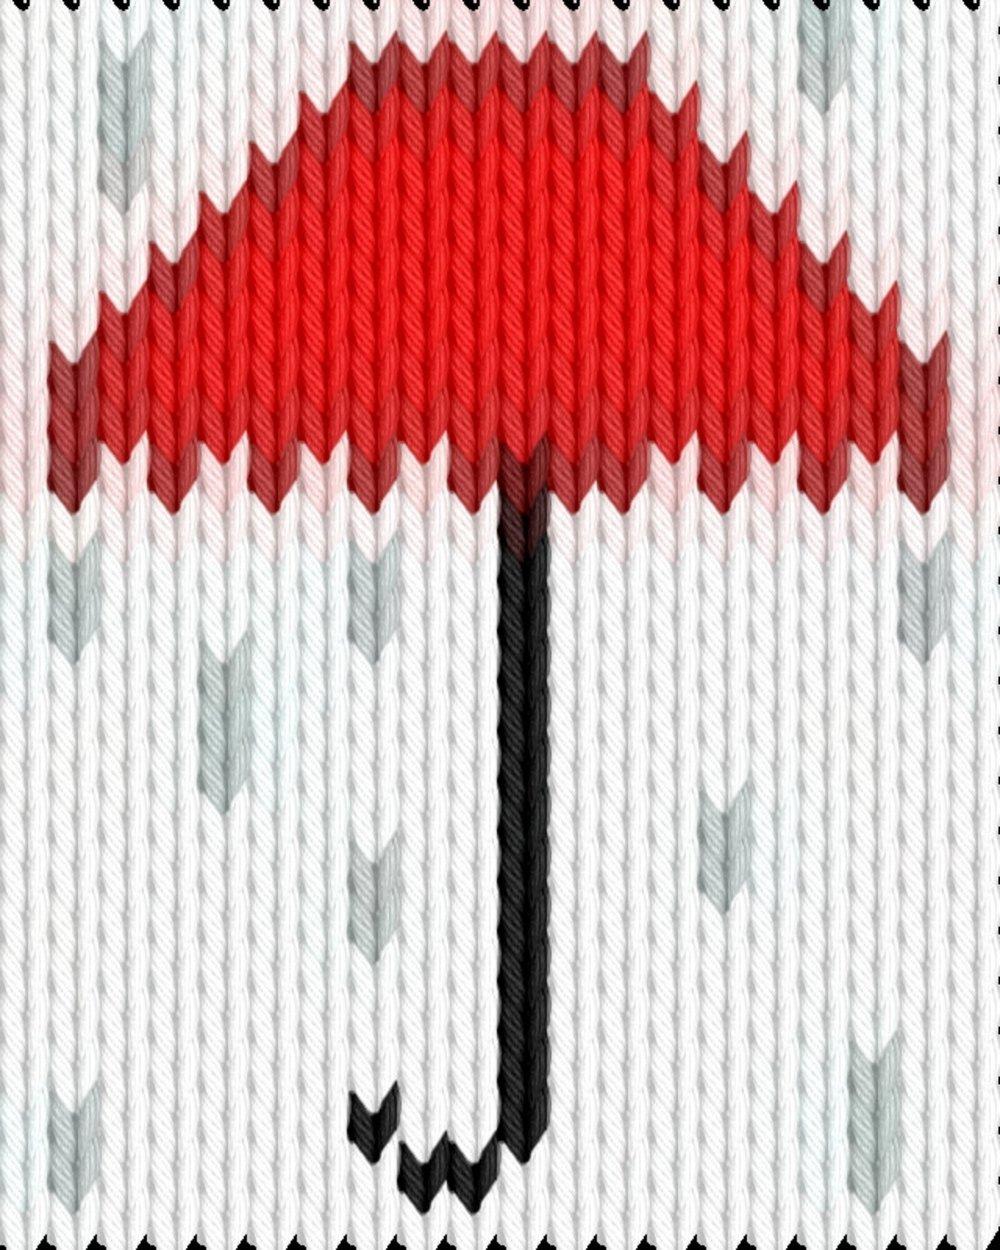 Knitting motif chart, Umbrela